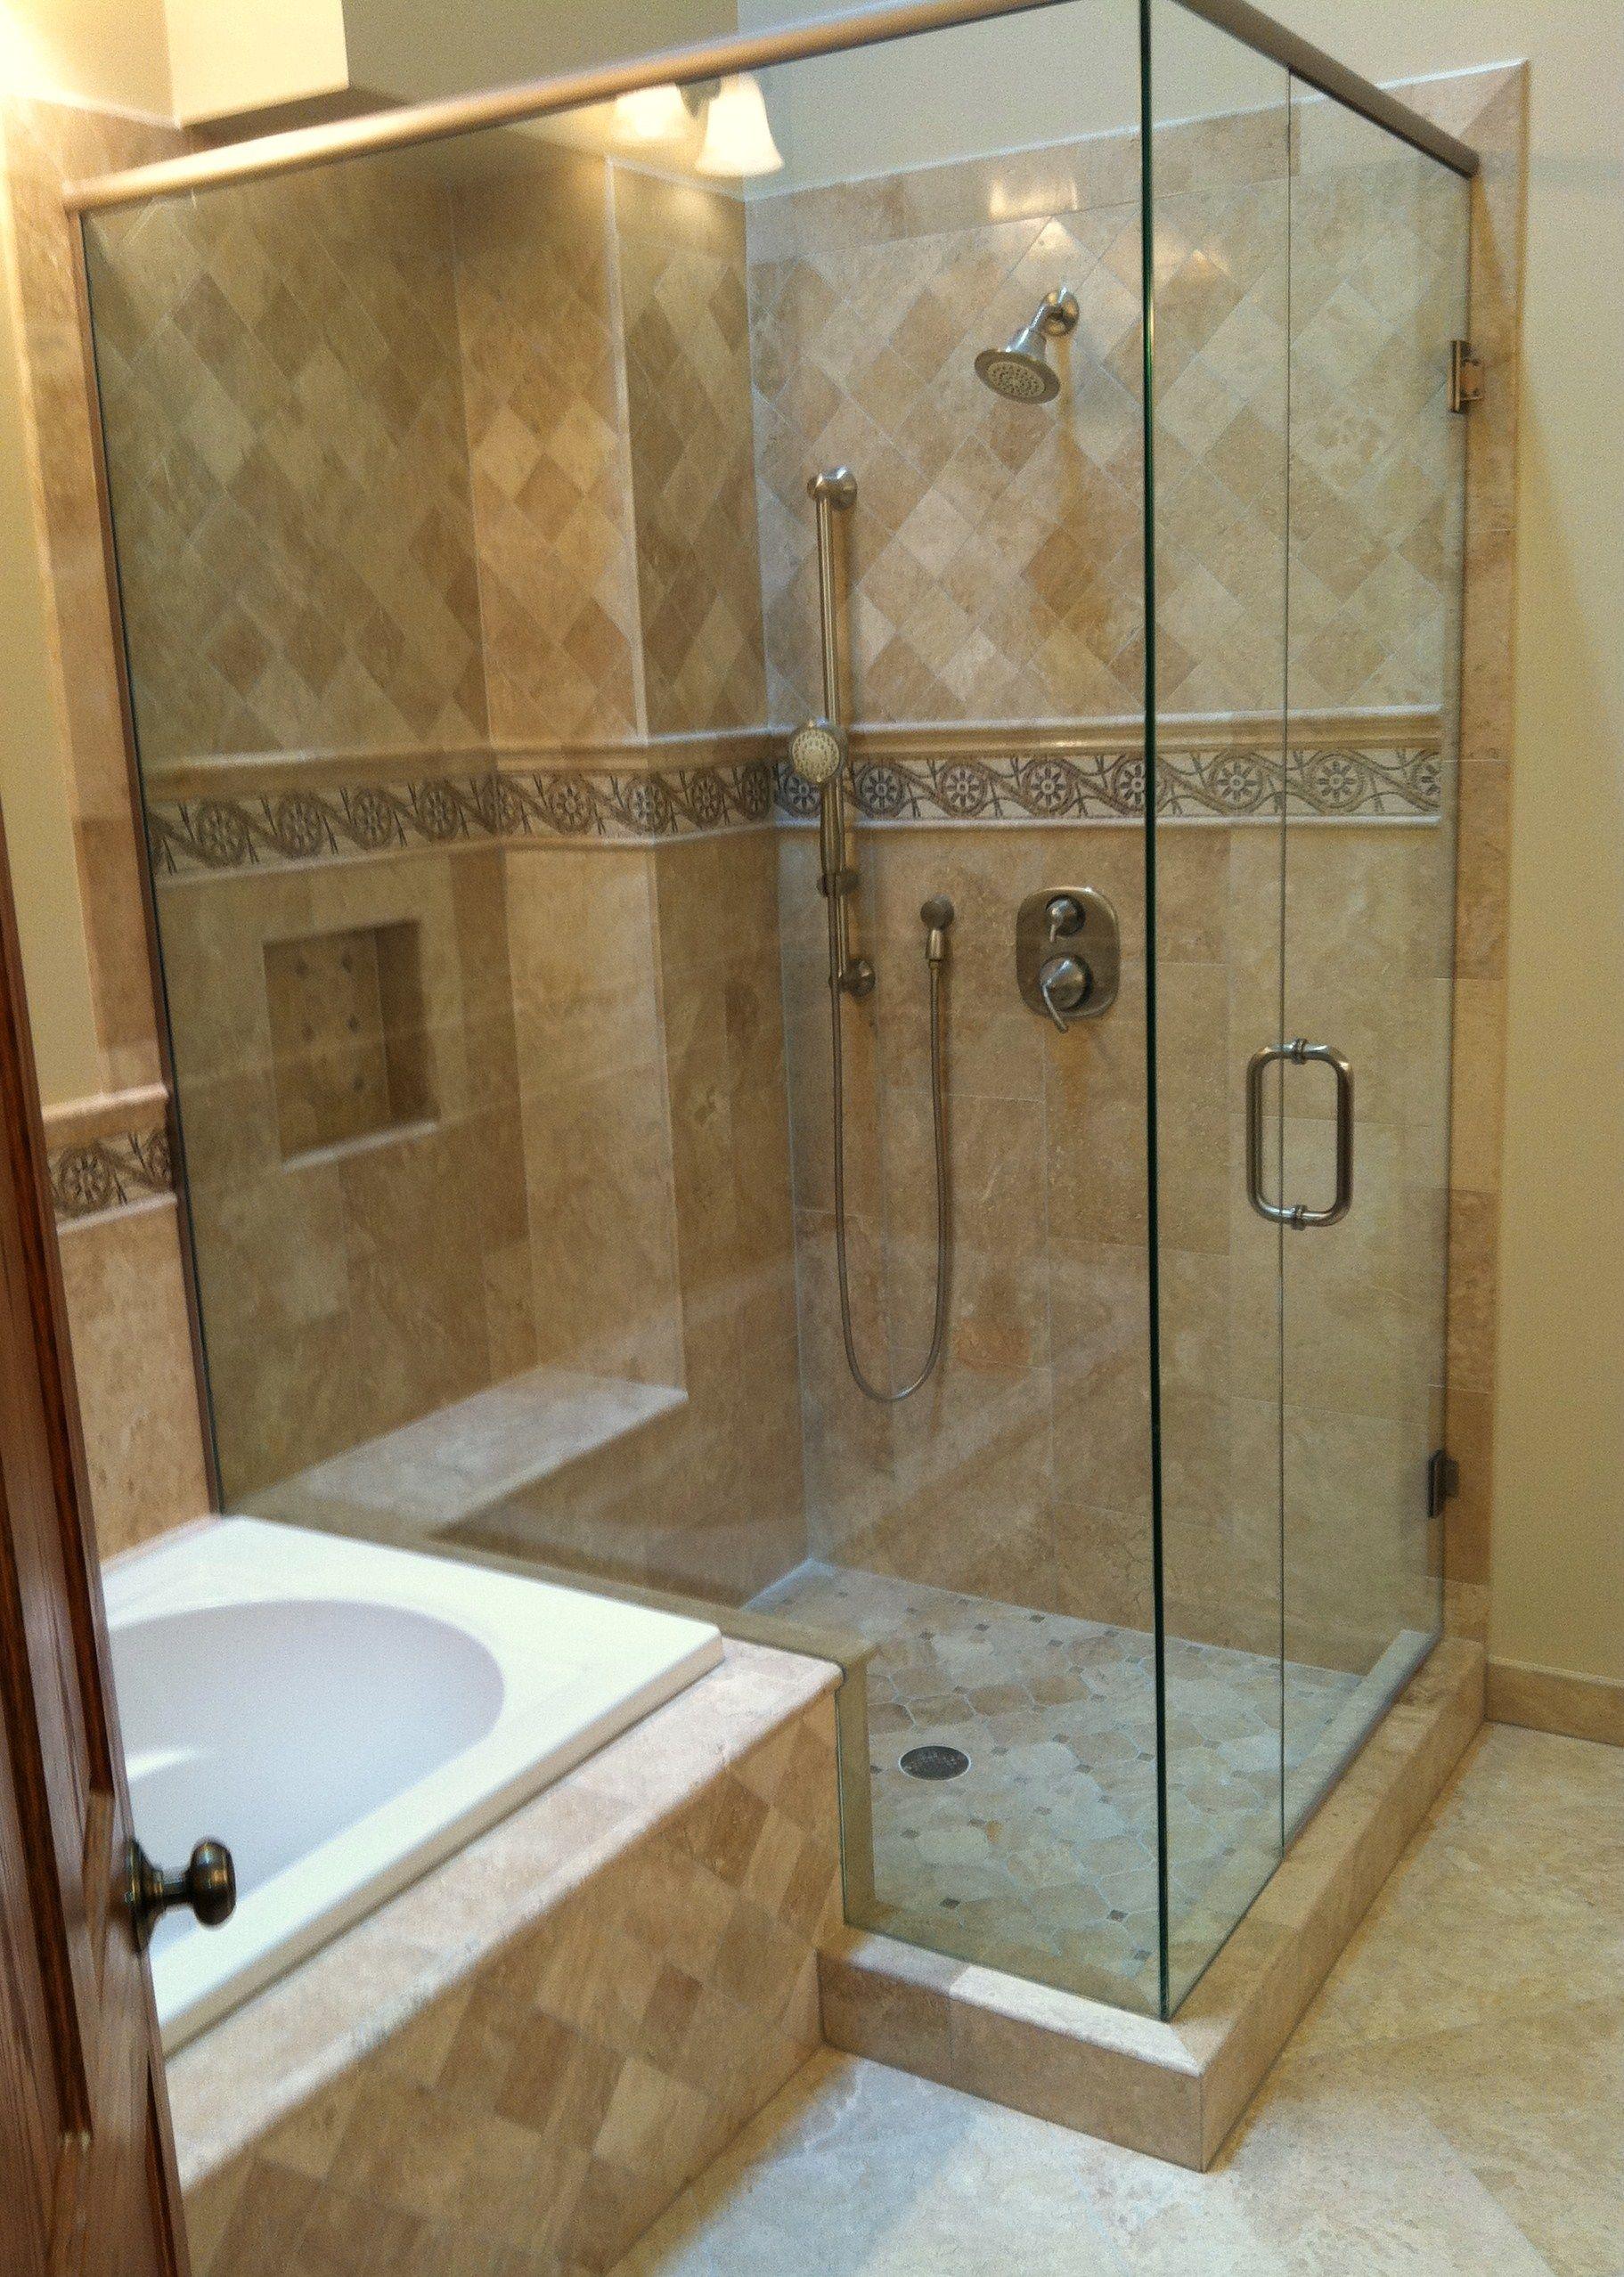 Bathroom Remodel Companies Property Images Design Inspiration